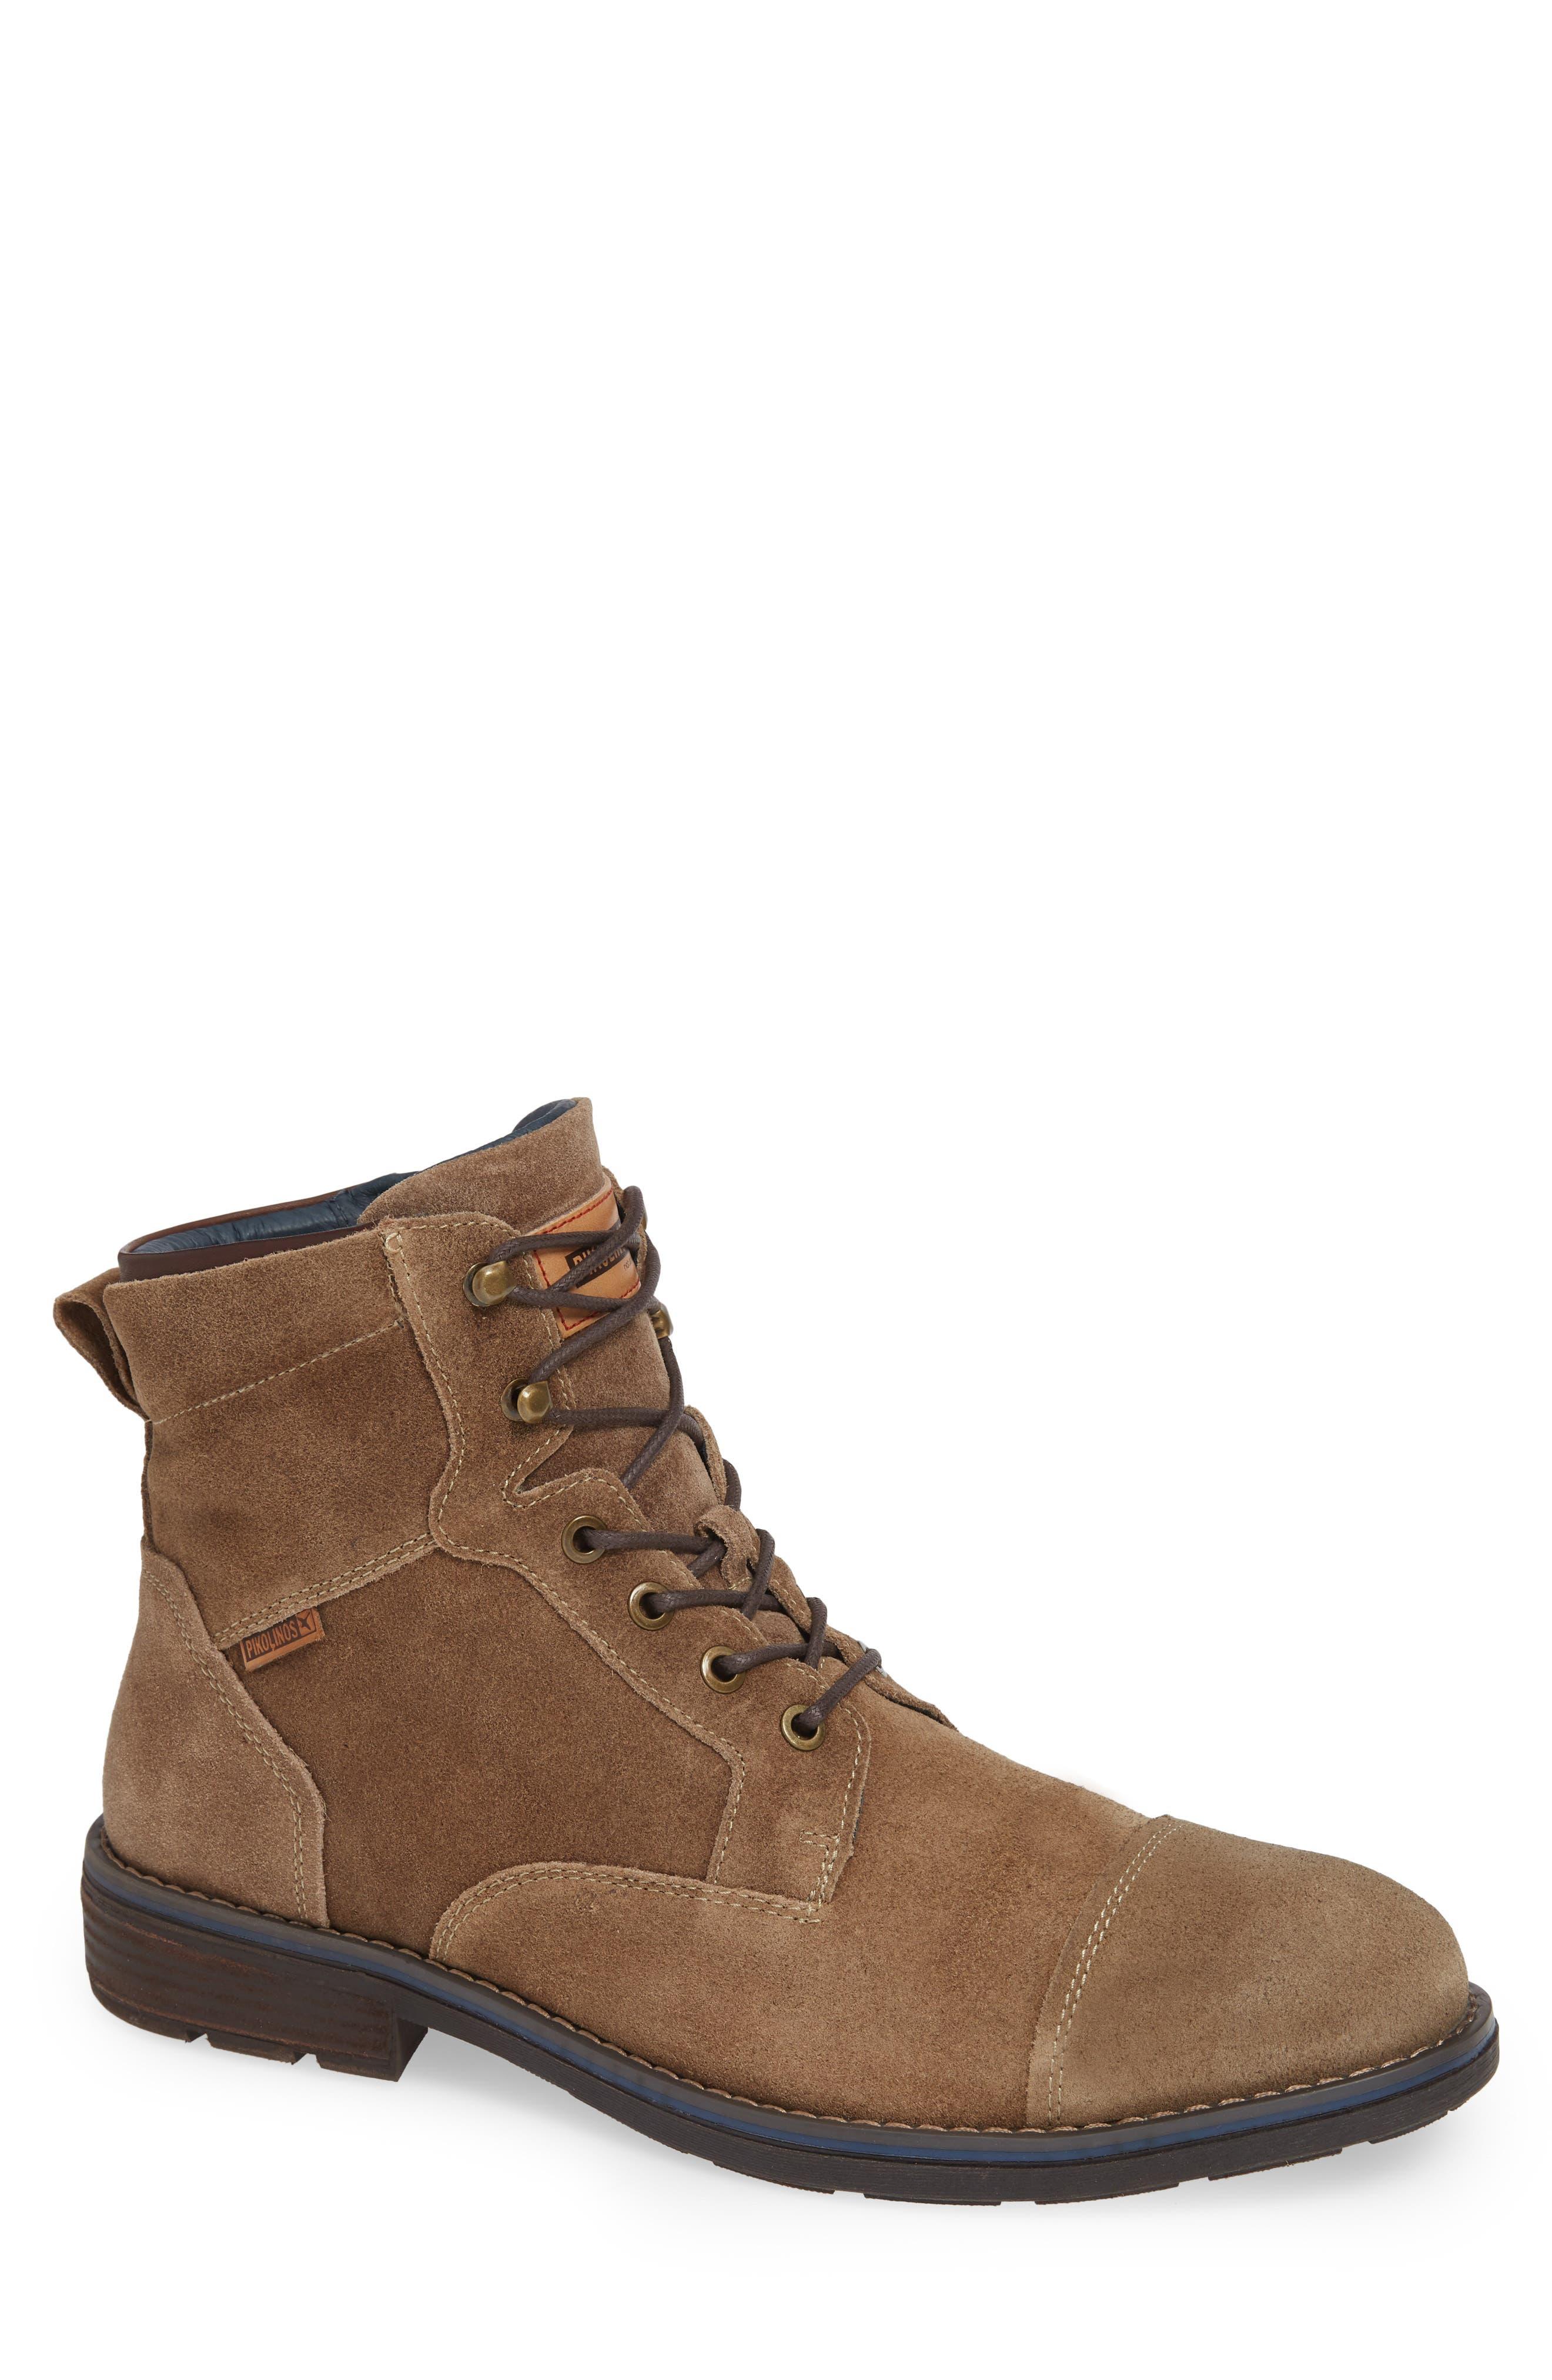 Pikolinos York Cap Toe Boot - Beige